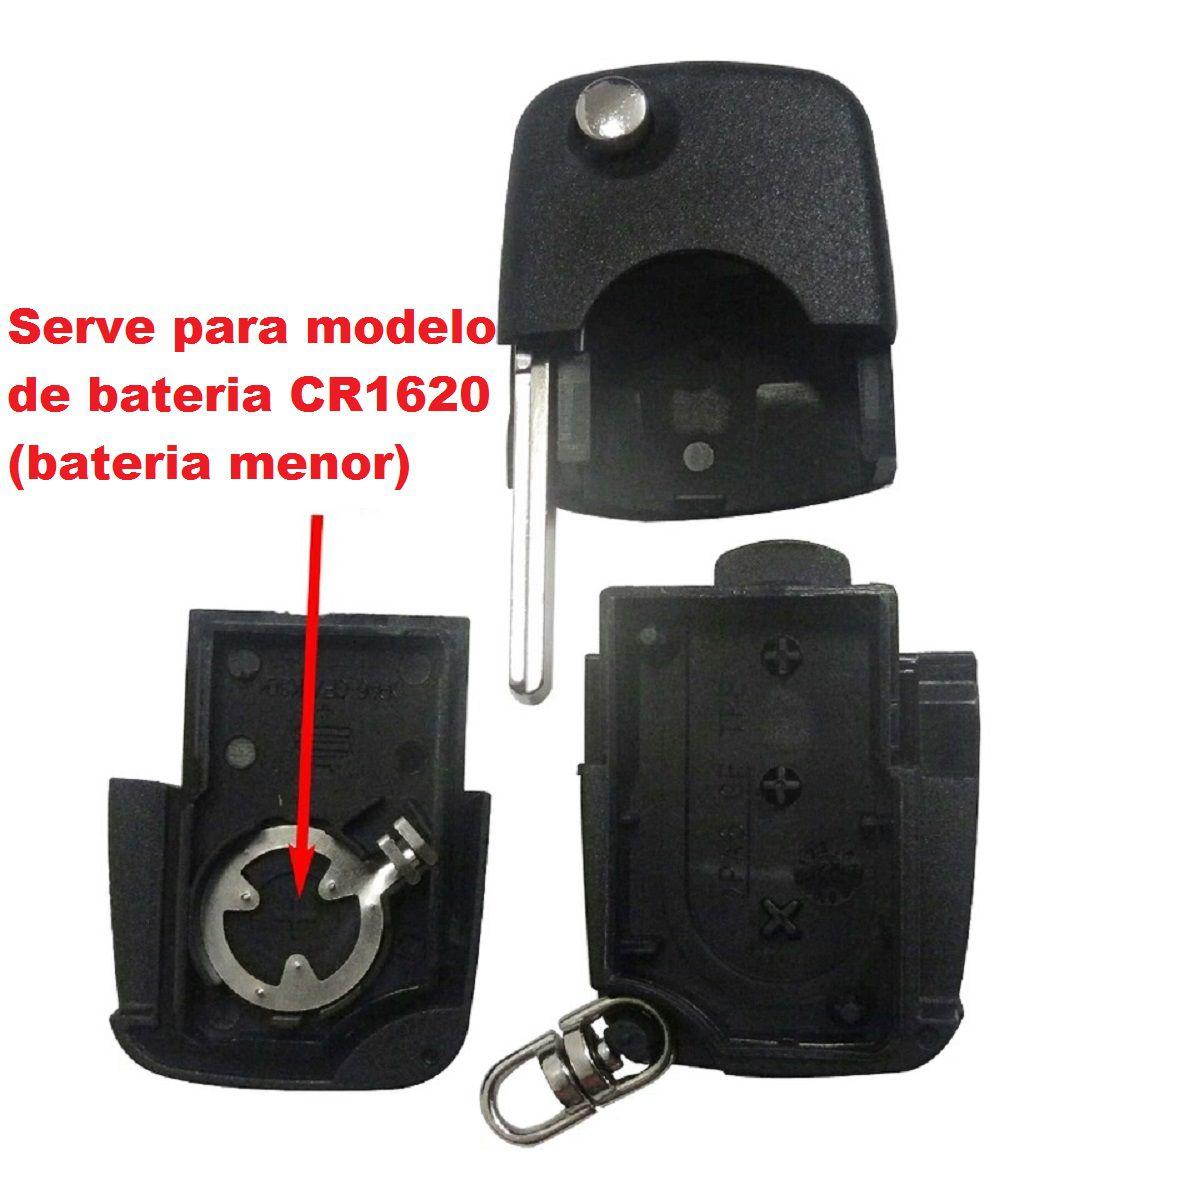 Chave Canivete Audi A3 A4 2 Botões Emblema e Lamina CR-1620